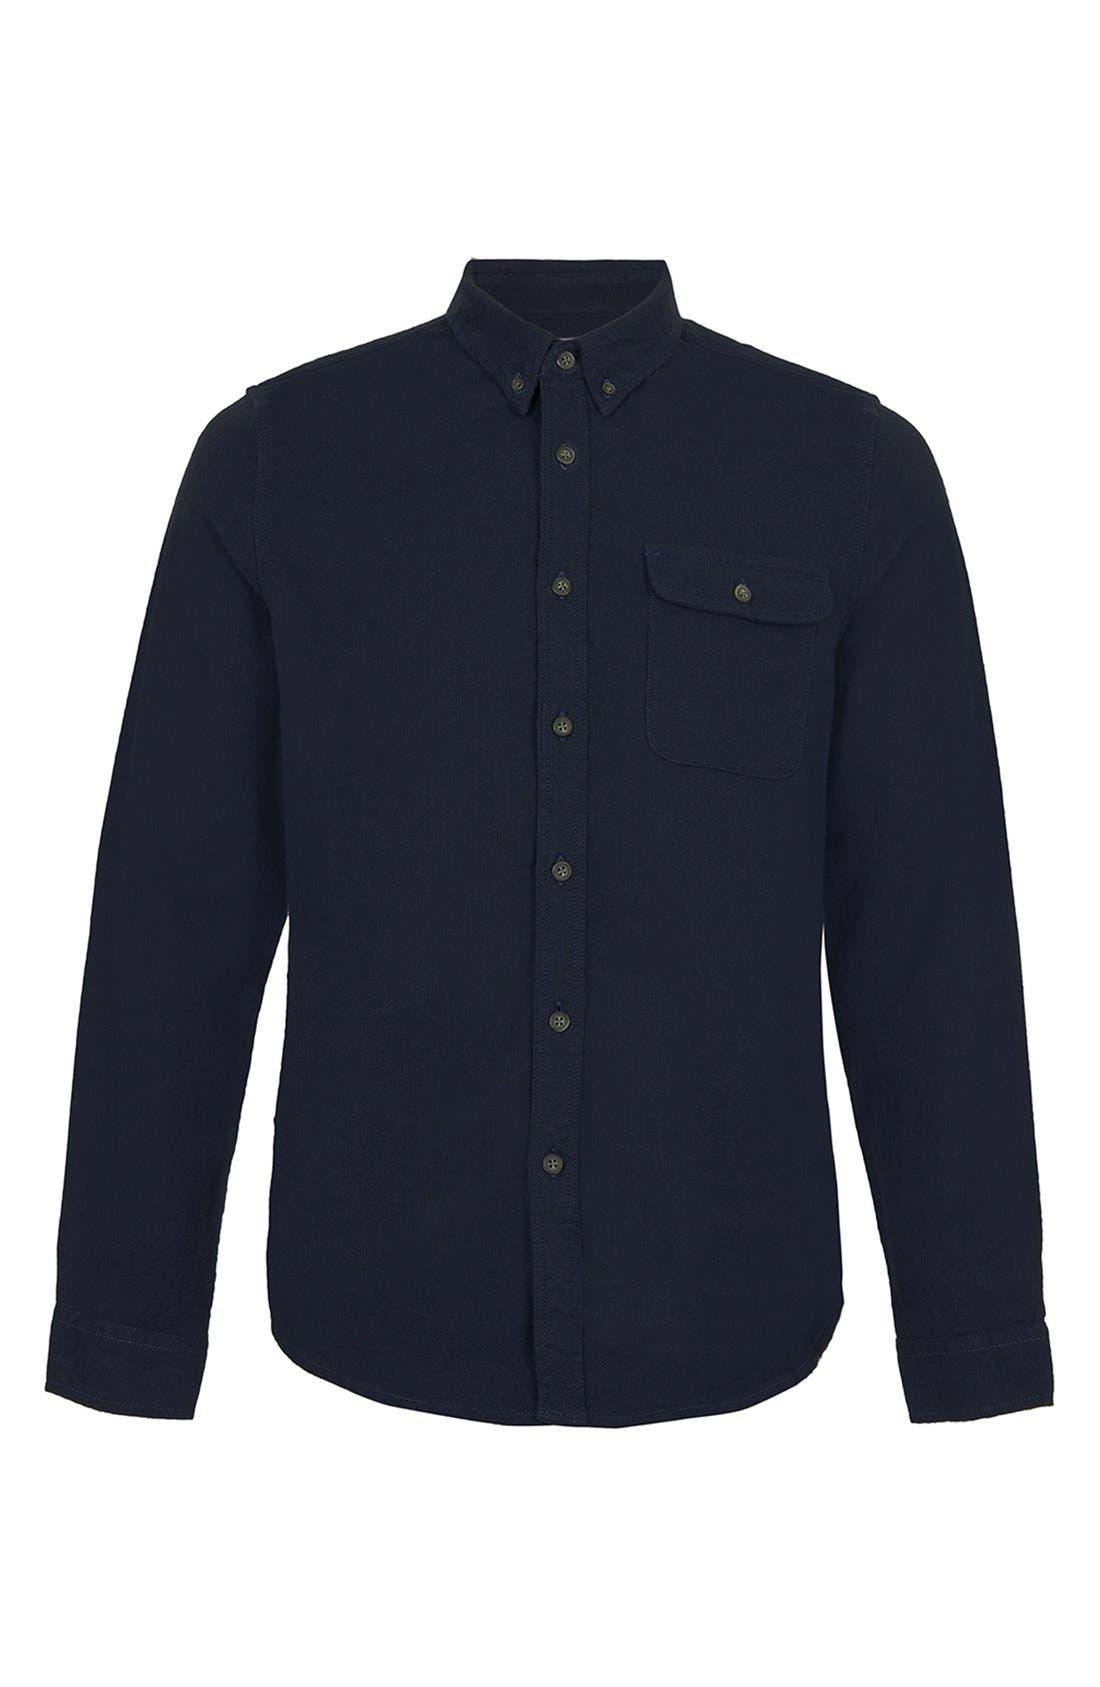 Main Image - Topman Brushed Herringbone Shirt